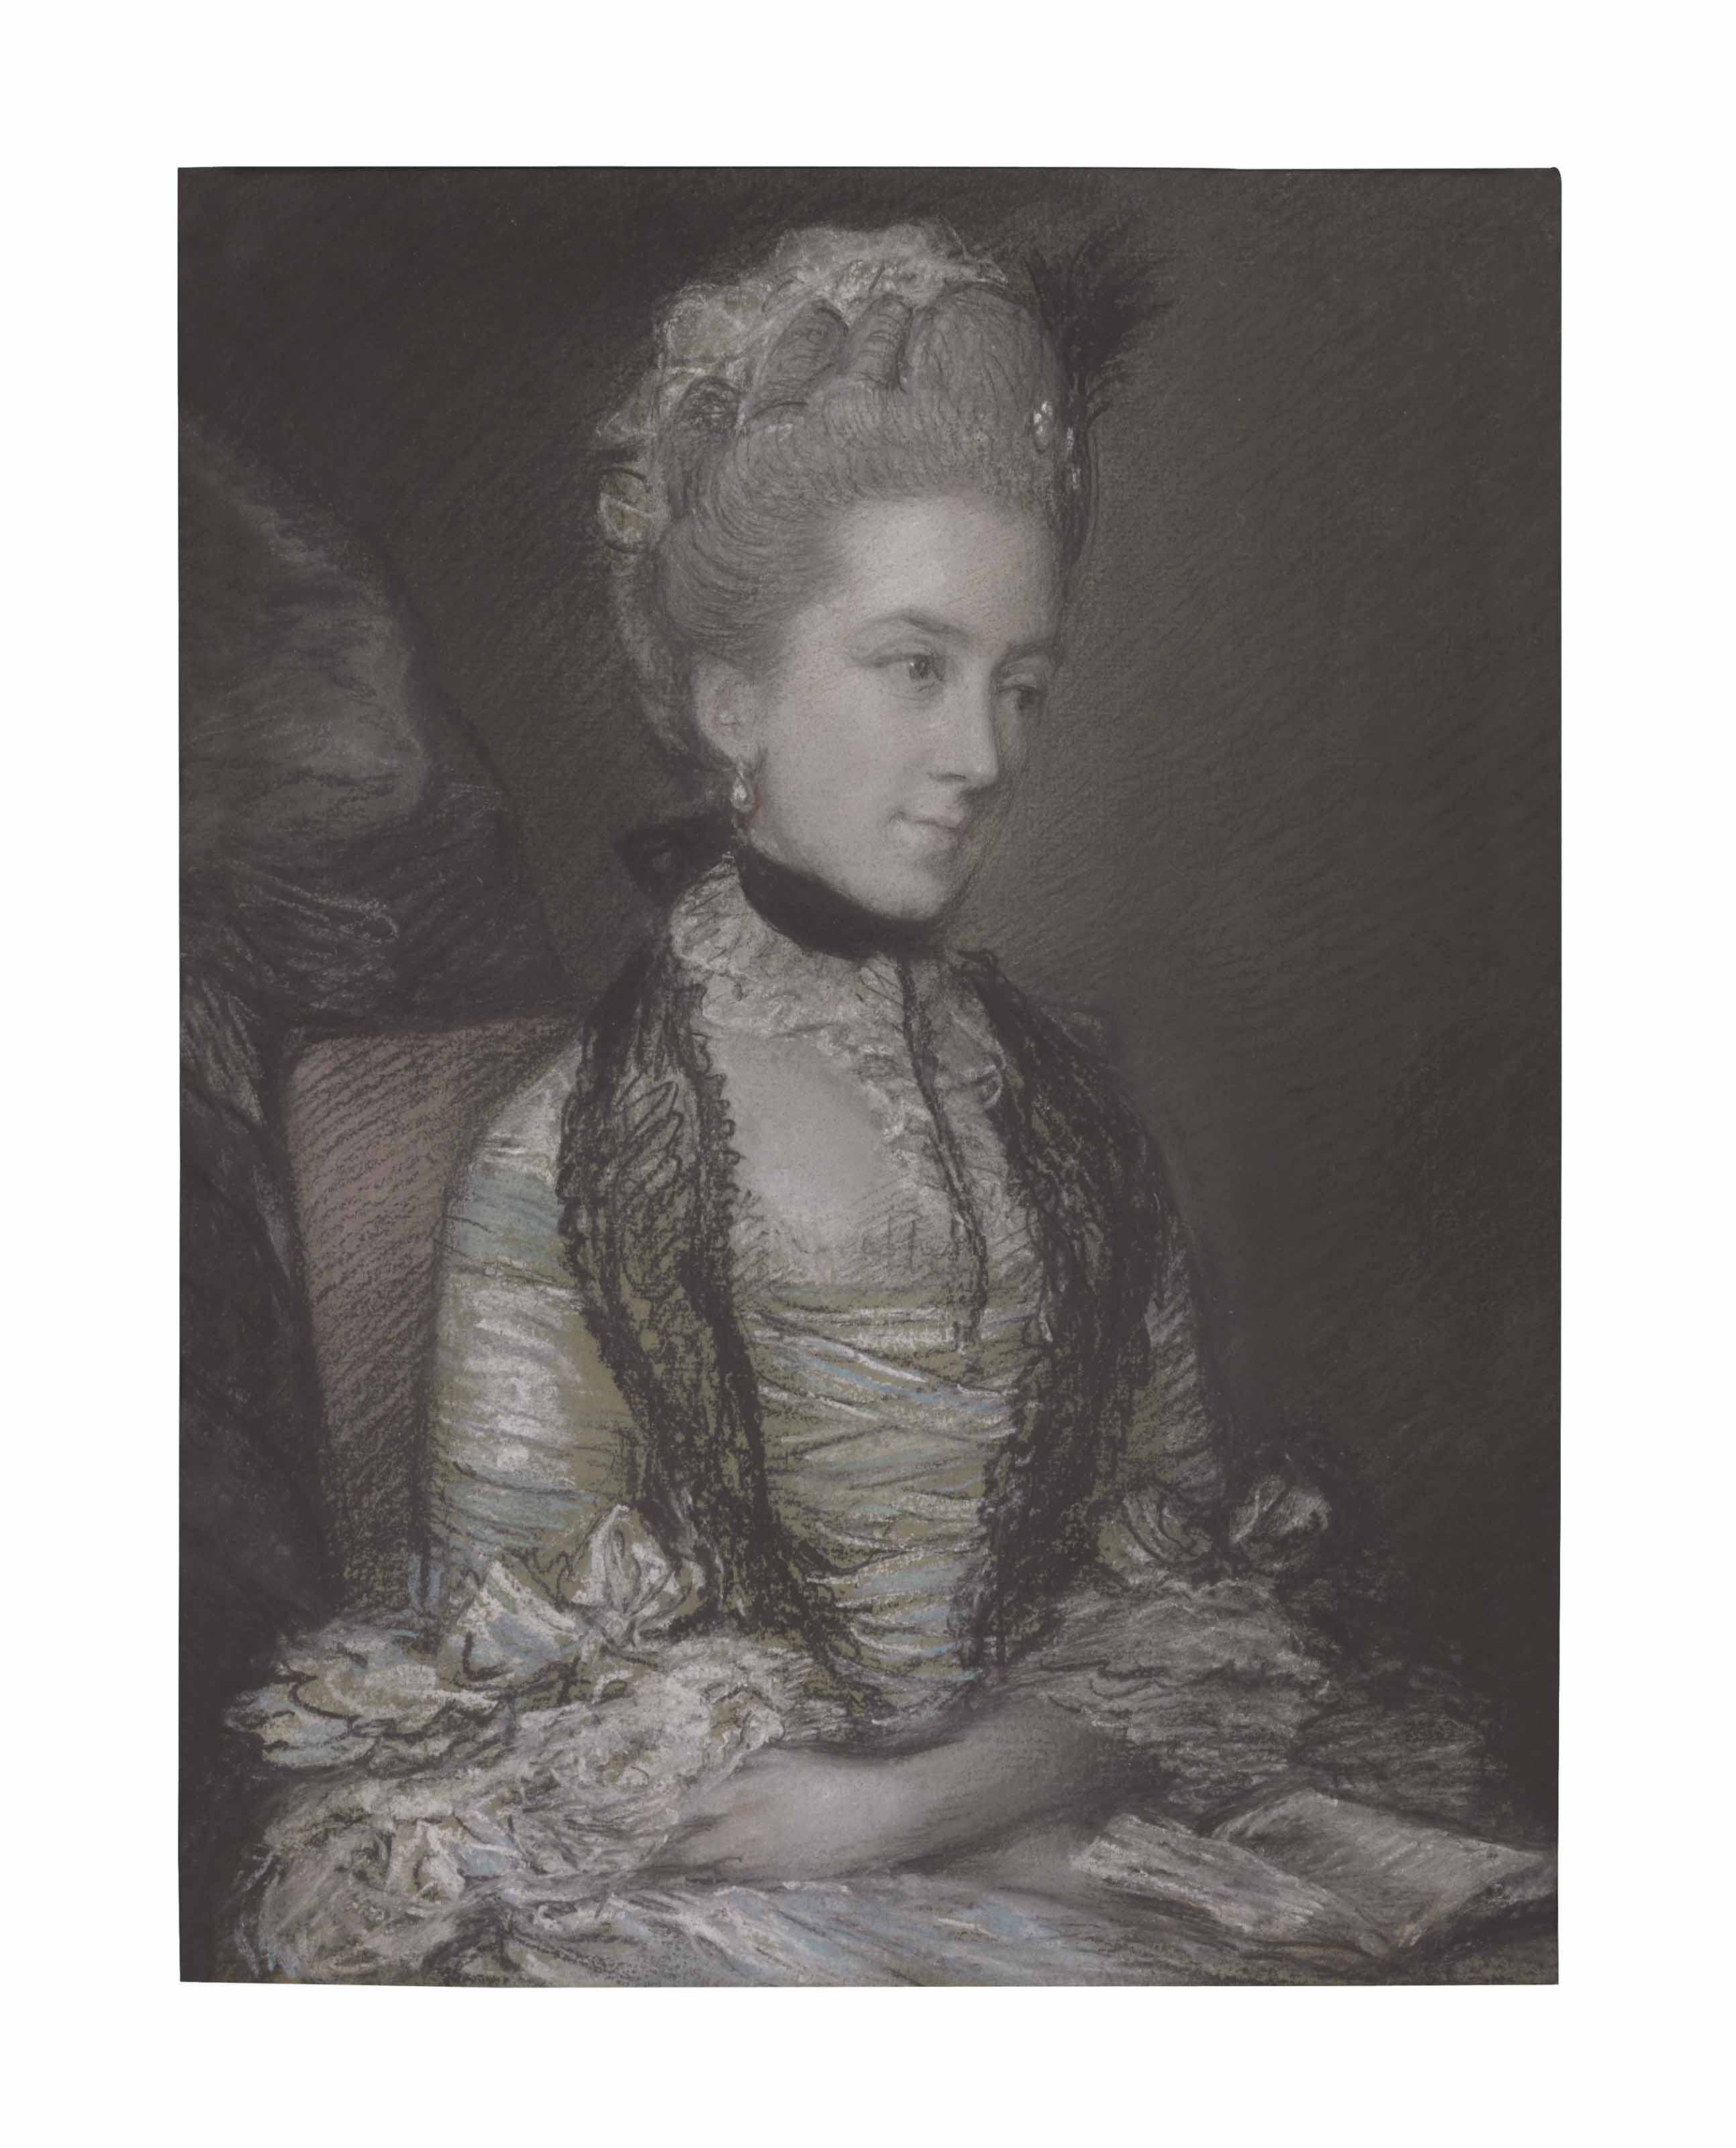 Thomas Gainsborough, R.A. (Sudbury, Suffolk 1727-1788 London)